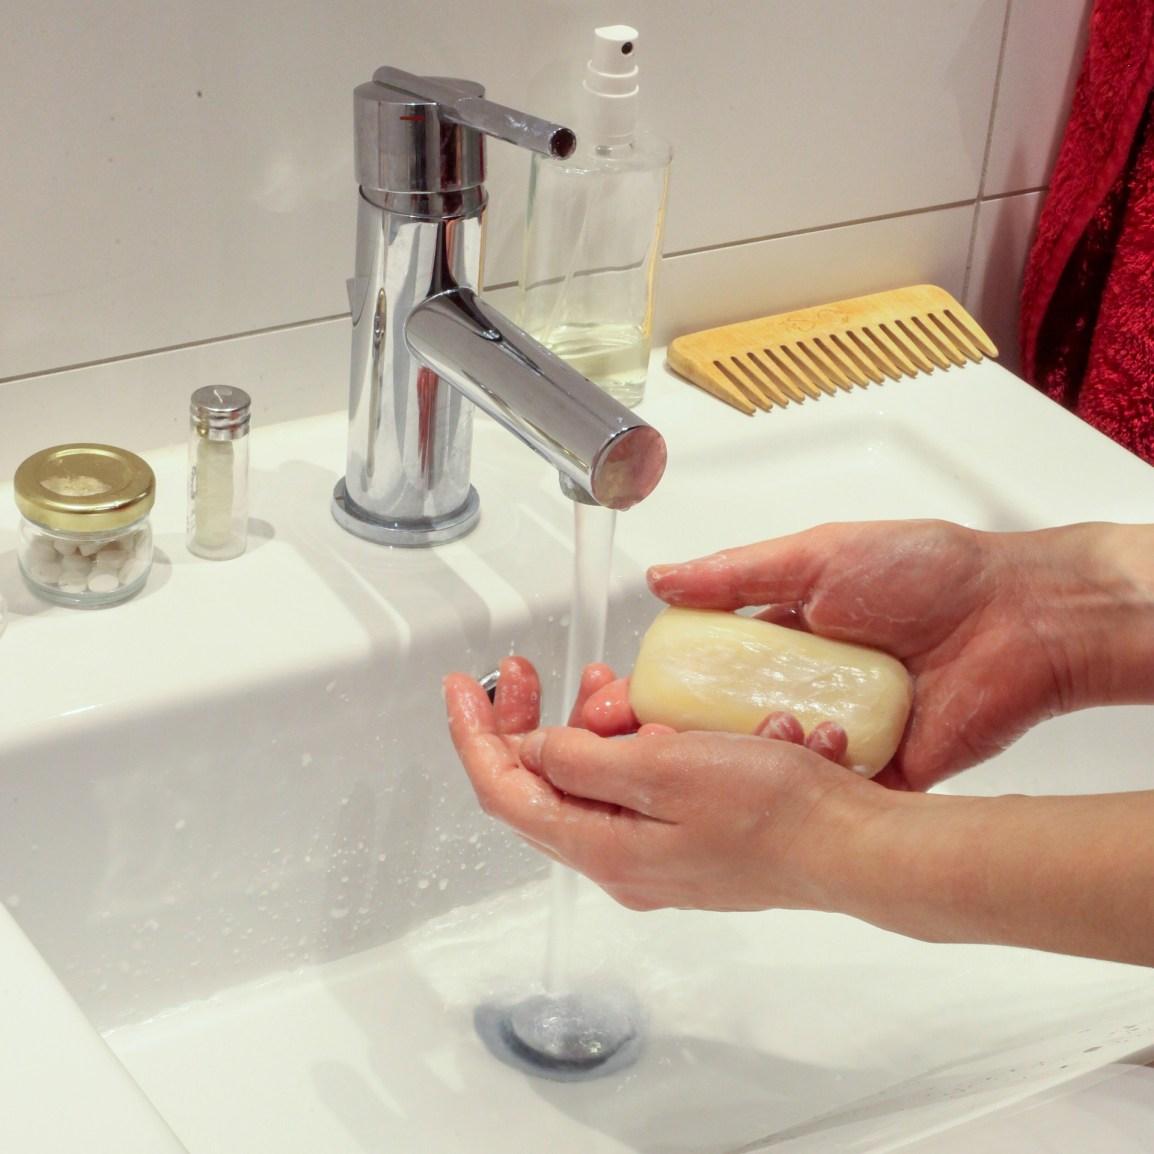 wash-hands-4941746_1920